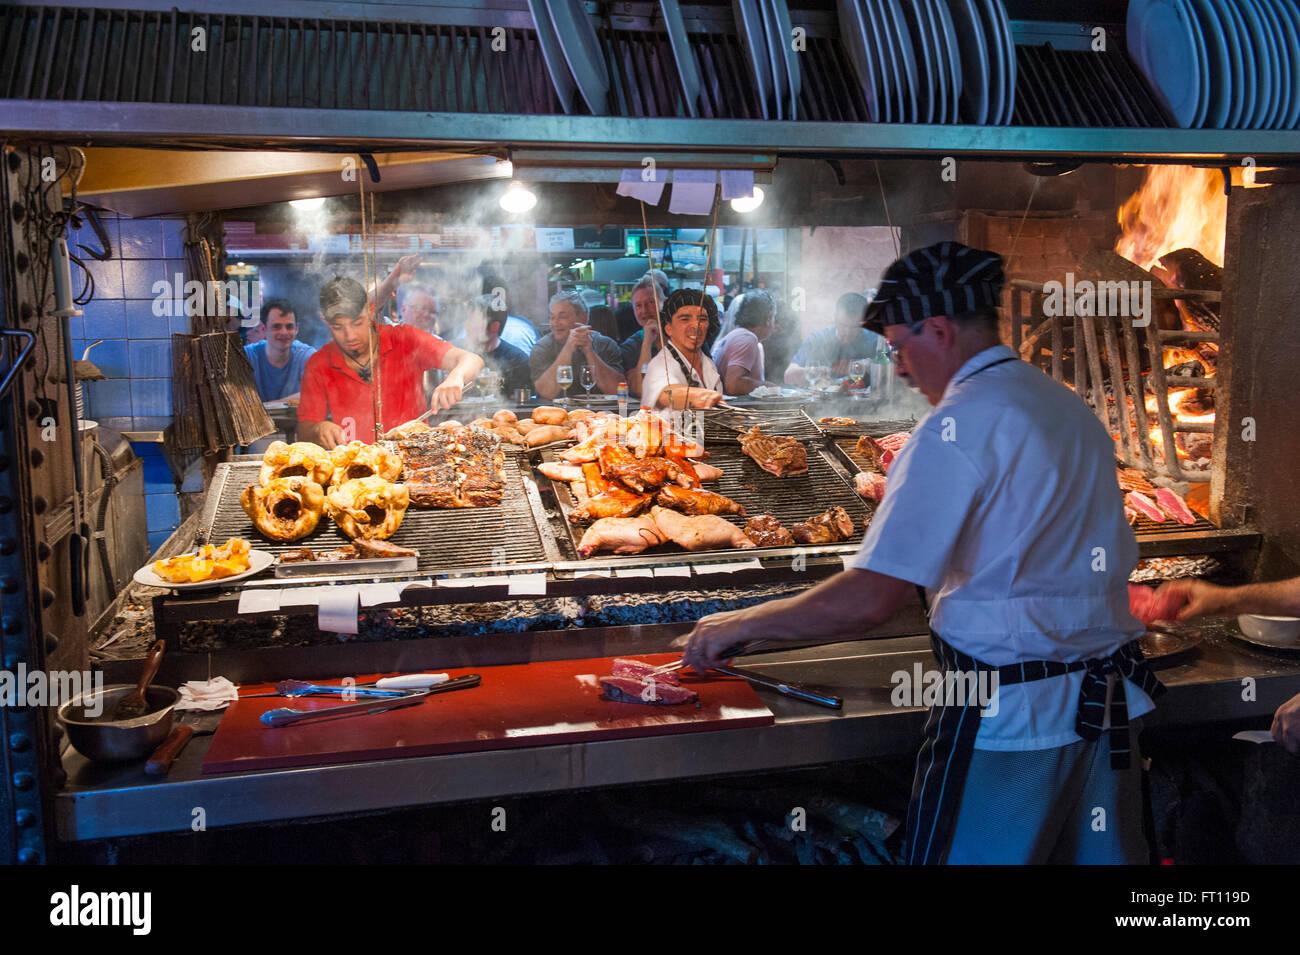 Cooks preparing steak and meat, Parilla type restaurant, Mercado del Puerto, Montevideo, Montevideo, Uruguay - Stock Image